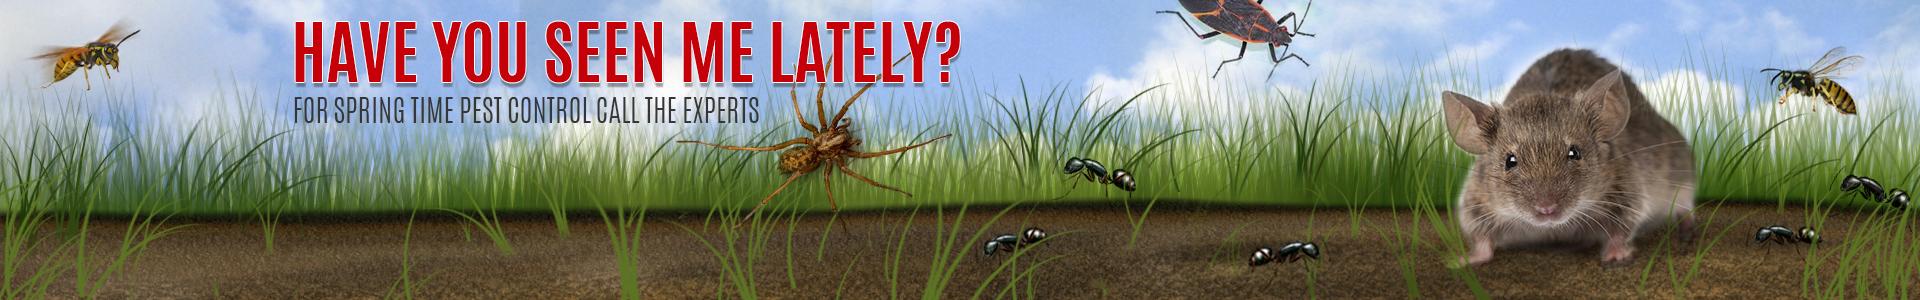 Pest Control, Exterminator, Madison WI | Kwik Kill Pest Control